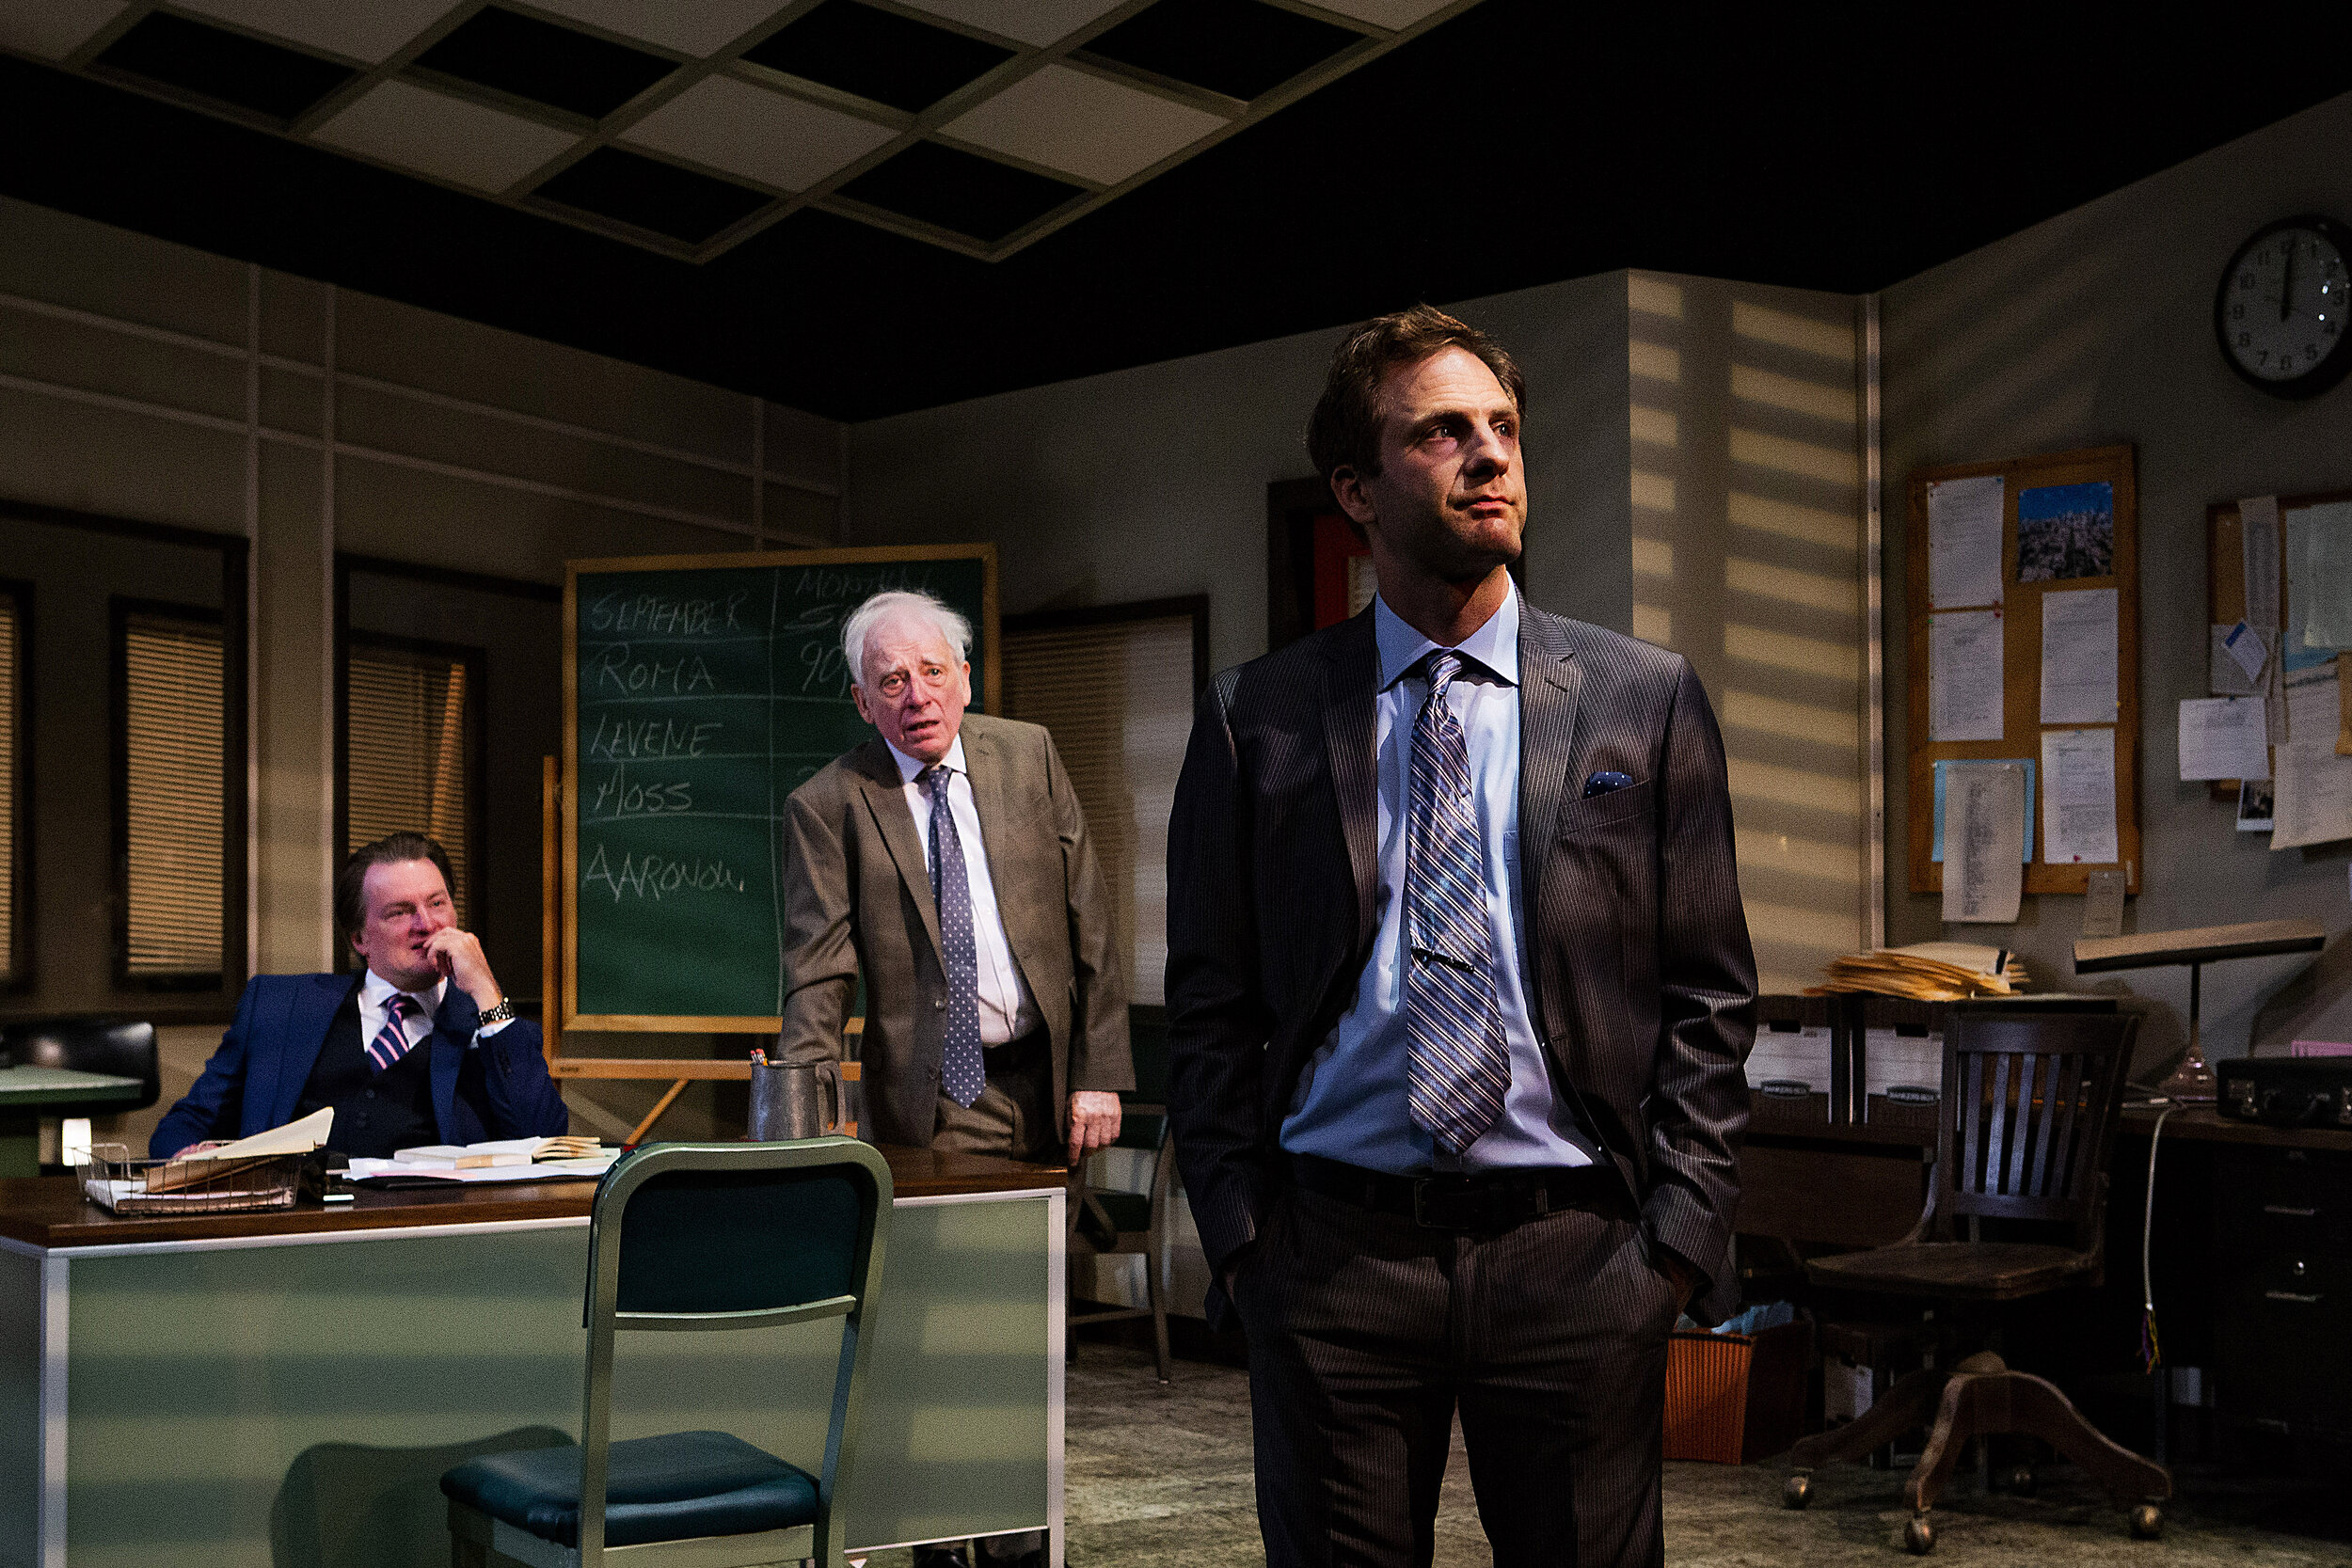 L to R: Christopher M. Bohan (Richard Roma), Austin Pendleton (Shelly Levene), Andrew Gorell (John Williamson)